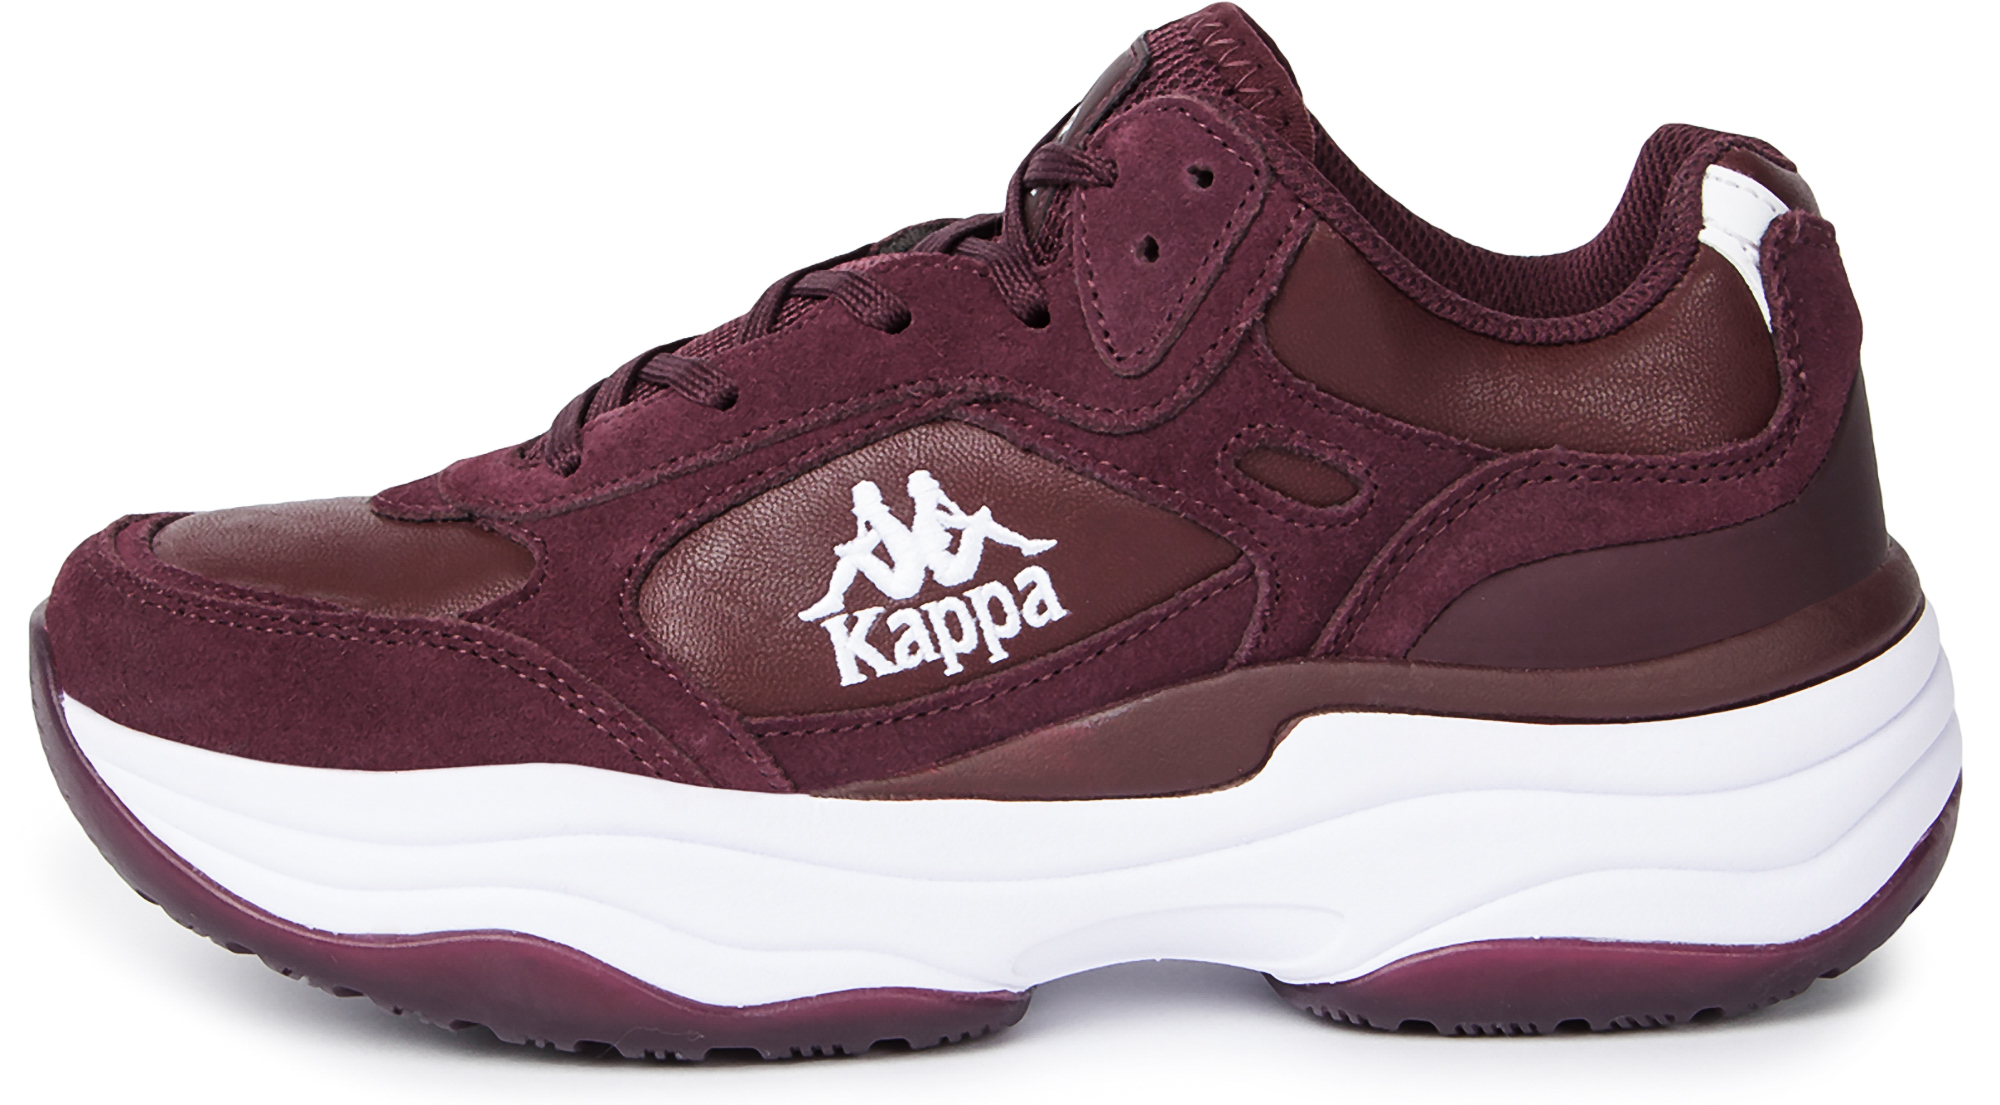 Kappa Кроссовки женские Kappa Renato, размер 40 kappa кроссовки женские kappa linea